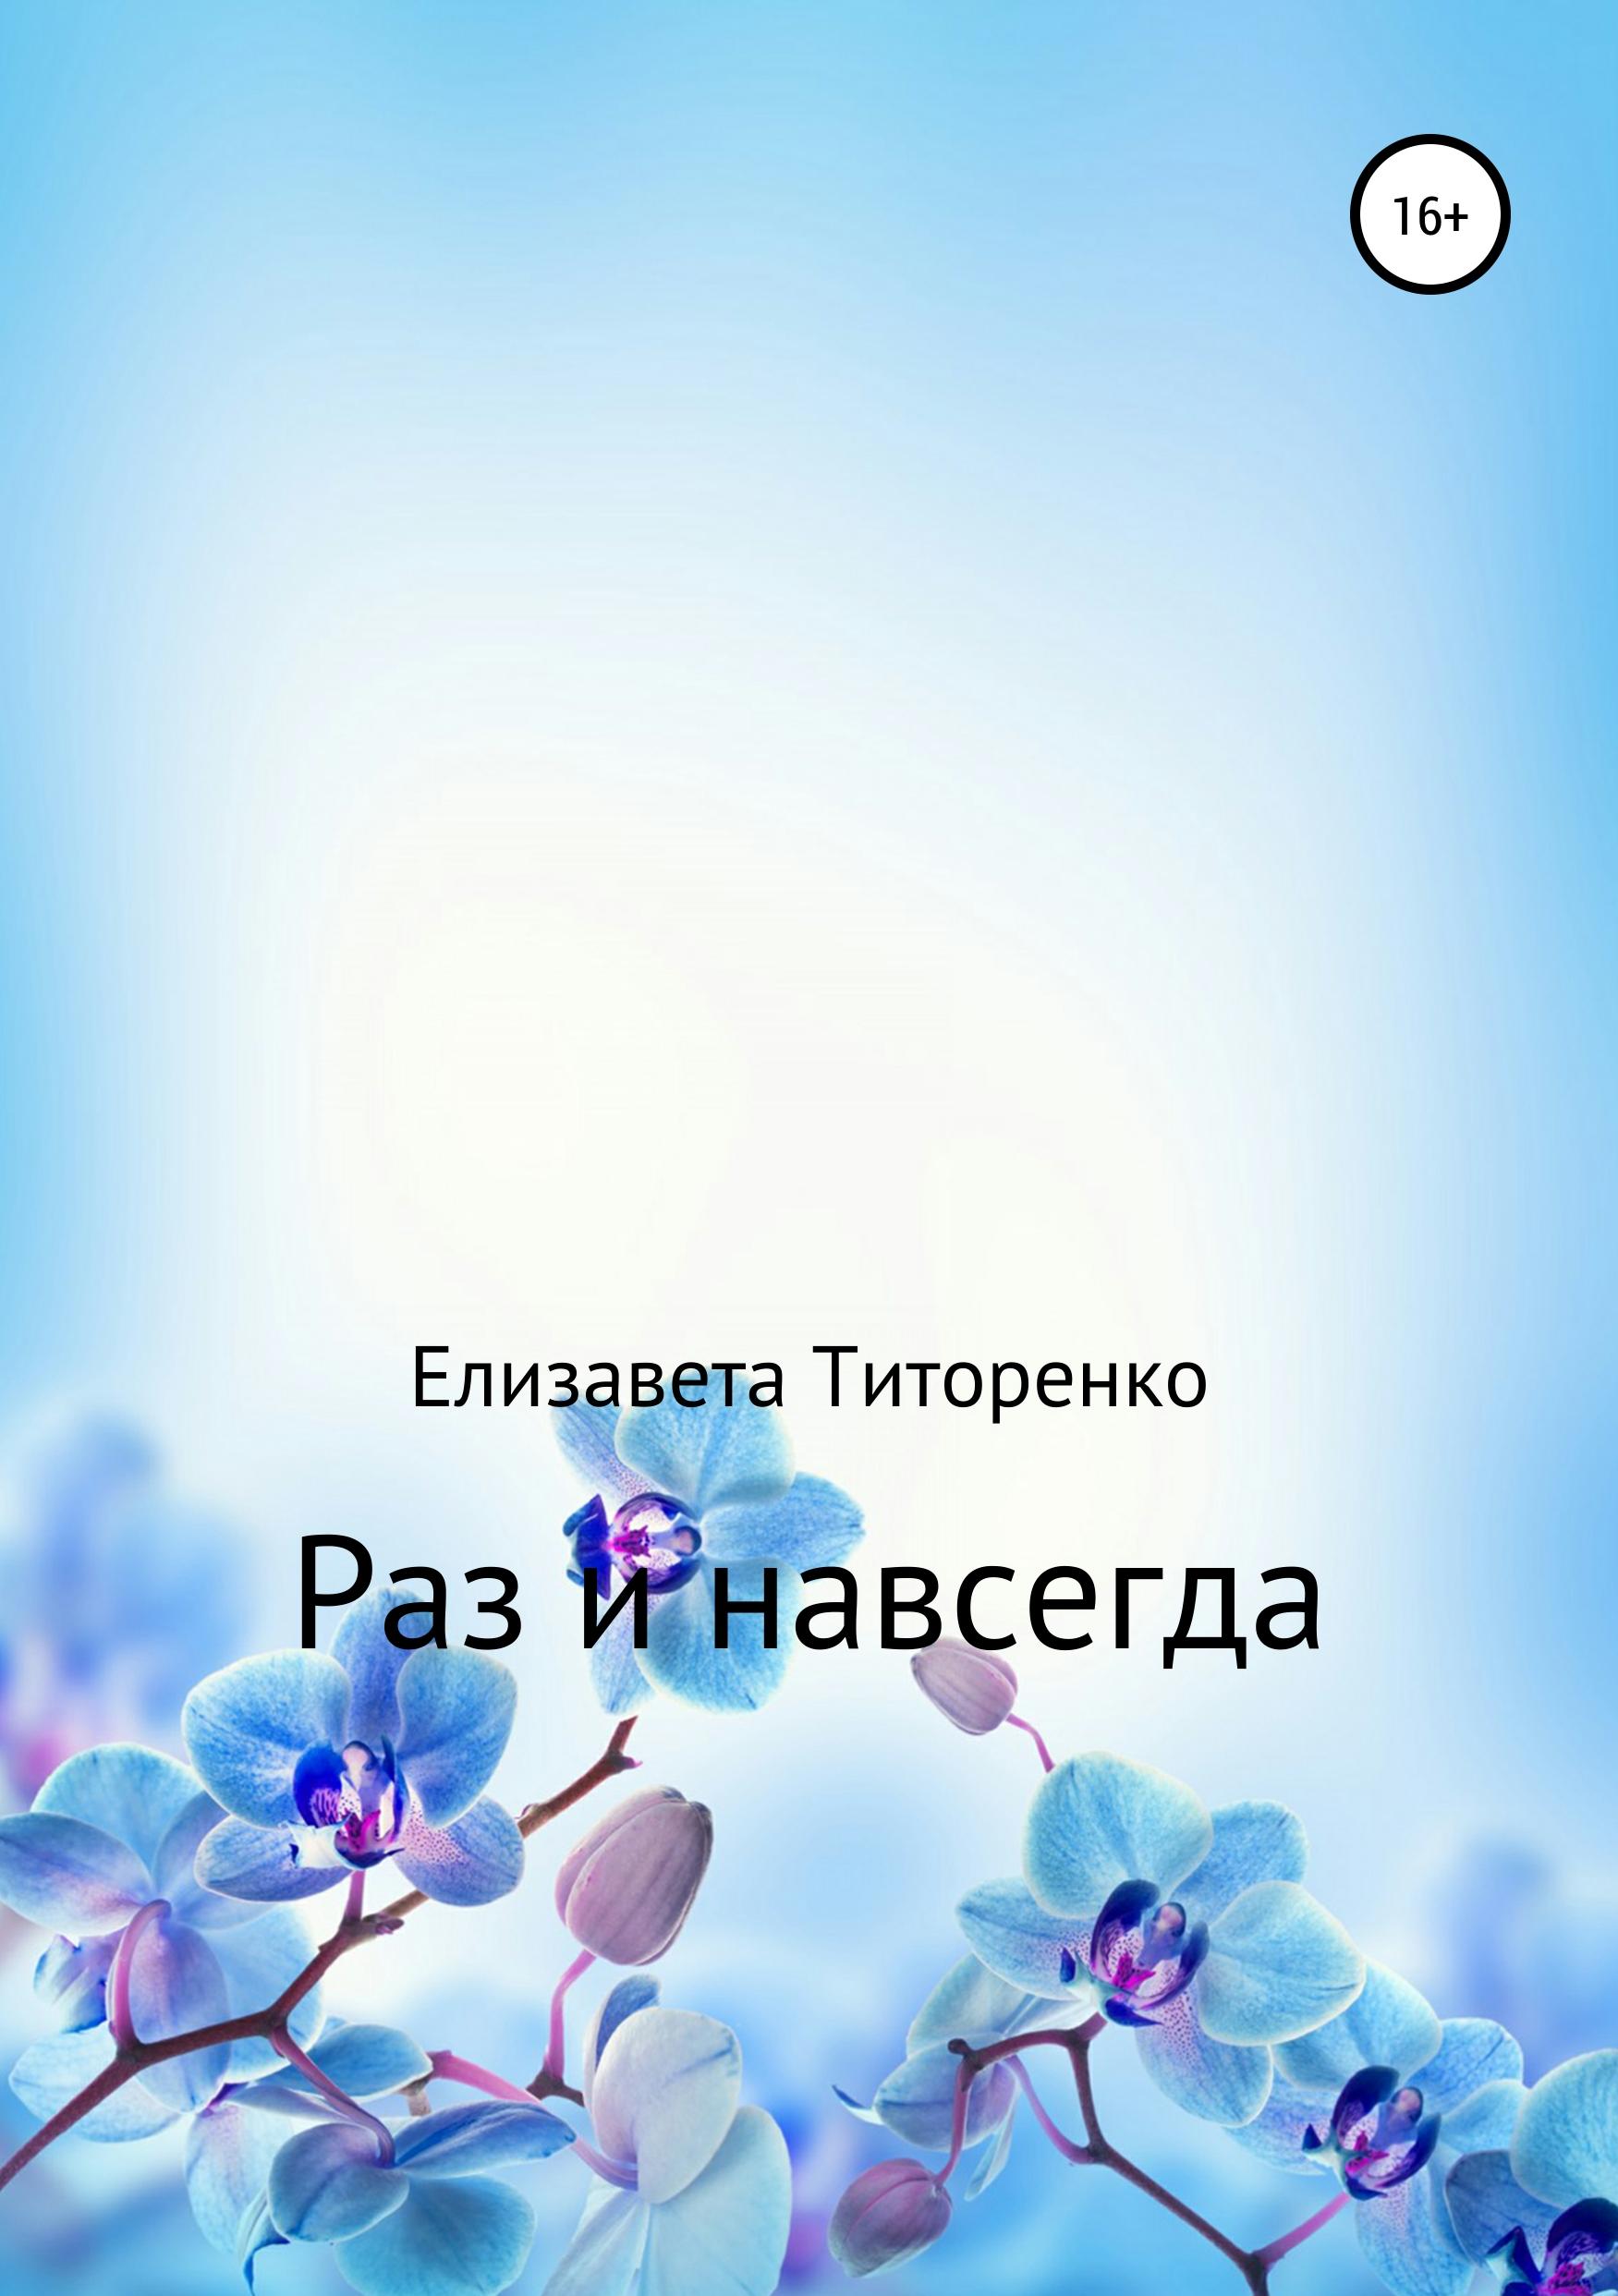 Елизавета Титоренко Раз и навсегда елизавета эдуардовна титоренко стихи избранное